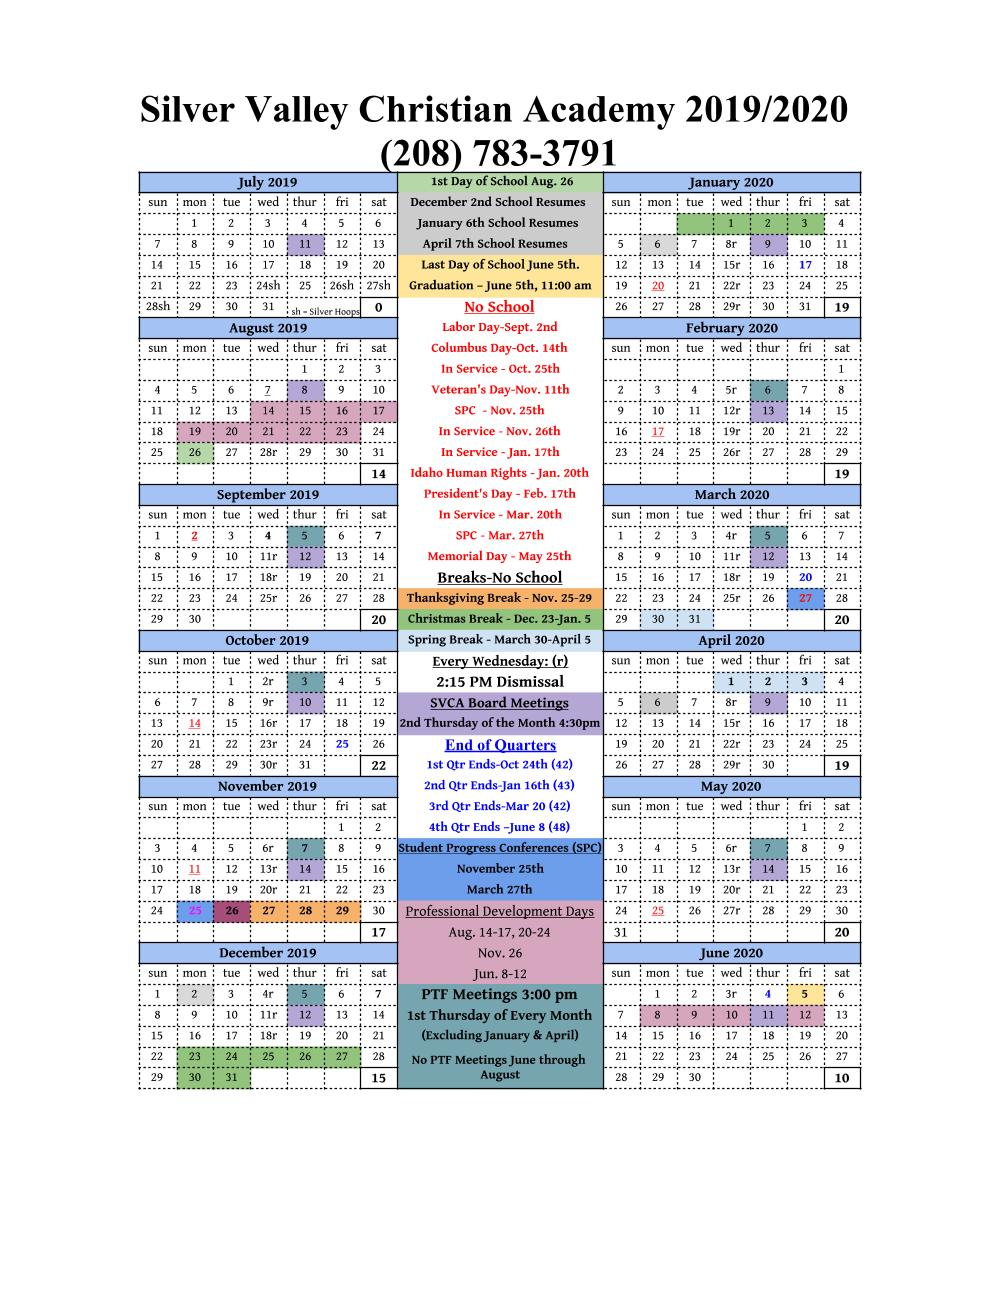 School Calendar — Silver Valley Christian Academy For Spokane Falls Commmunity College Acedemic Calender